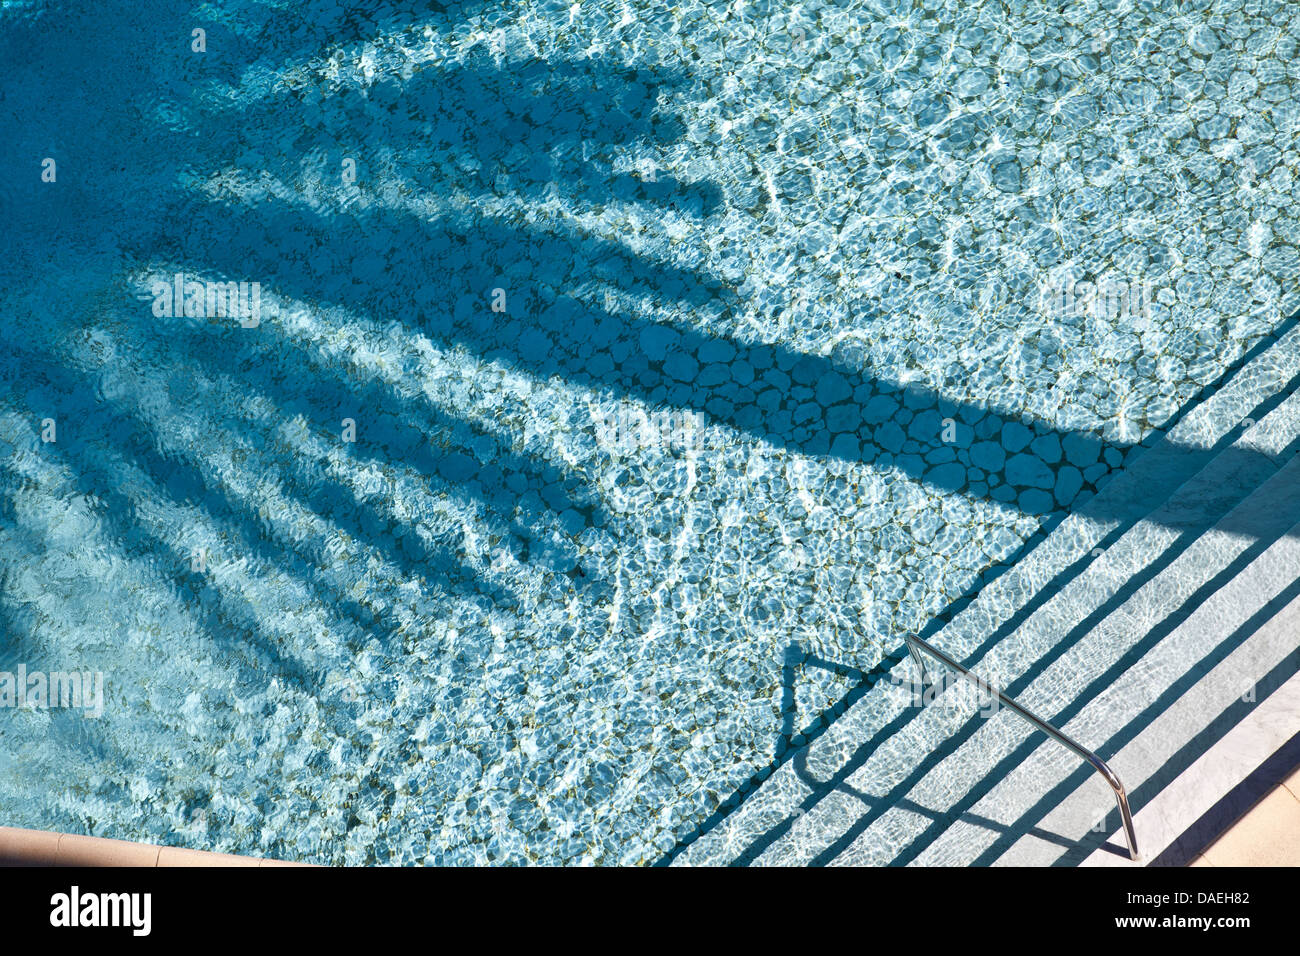 Swimming Pool mit Palmen Baum Schatten im Pool. Stockfoto